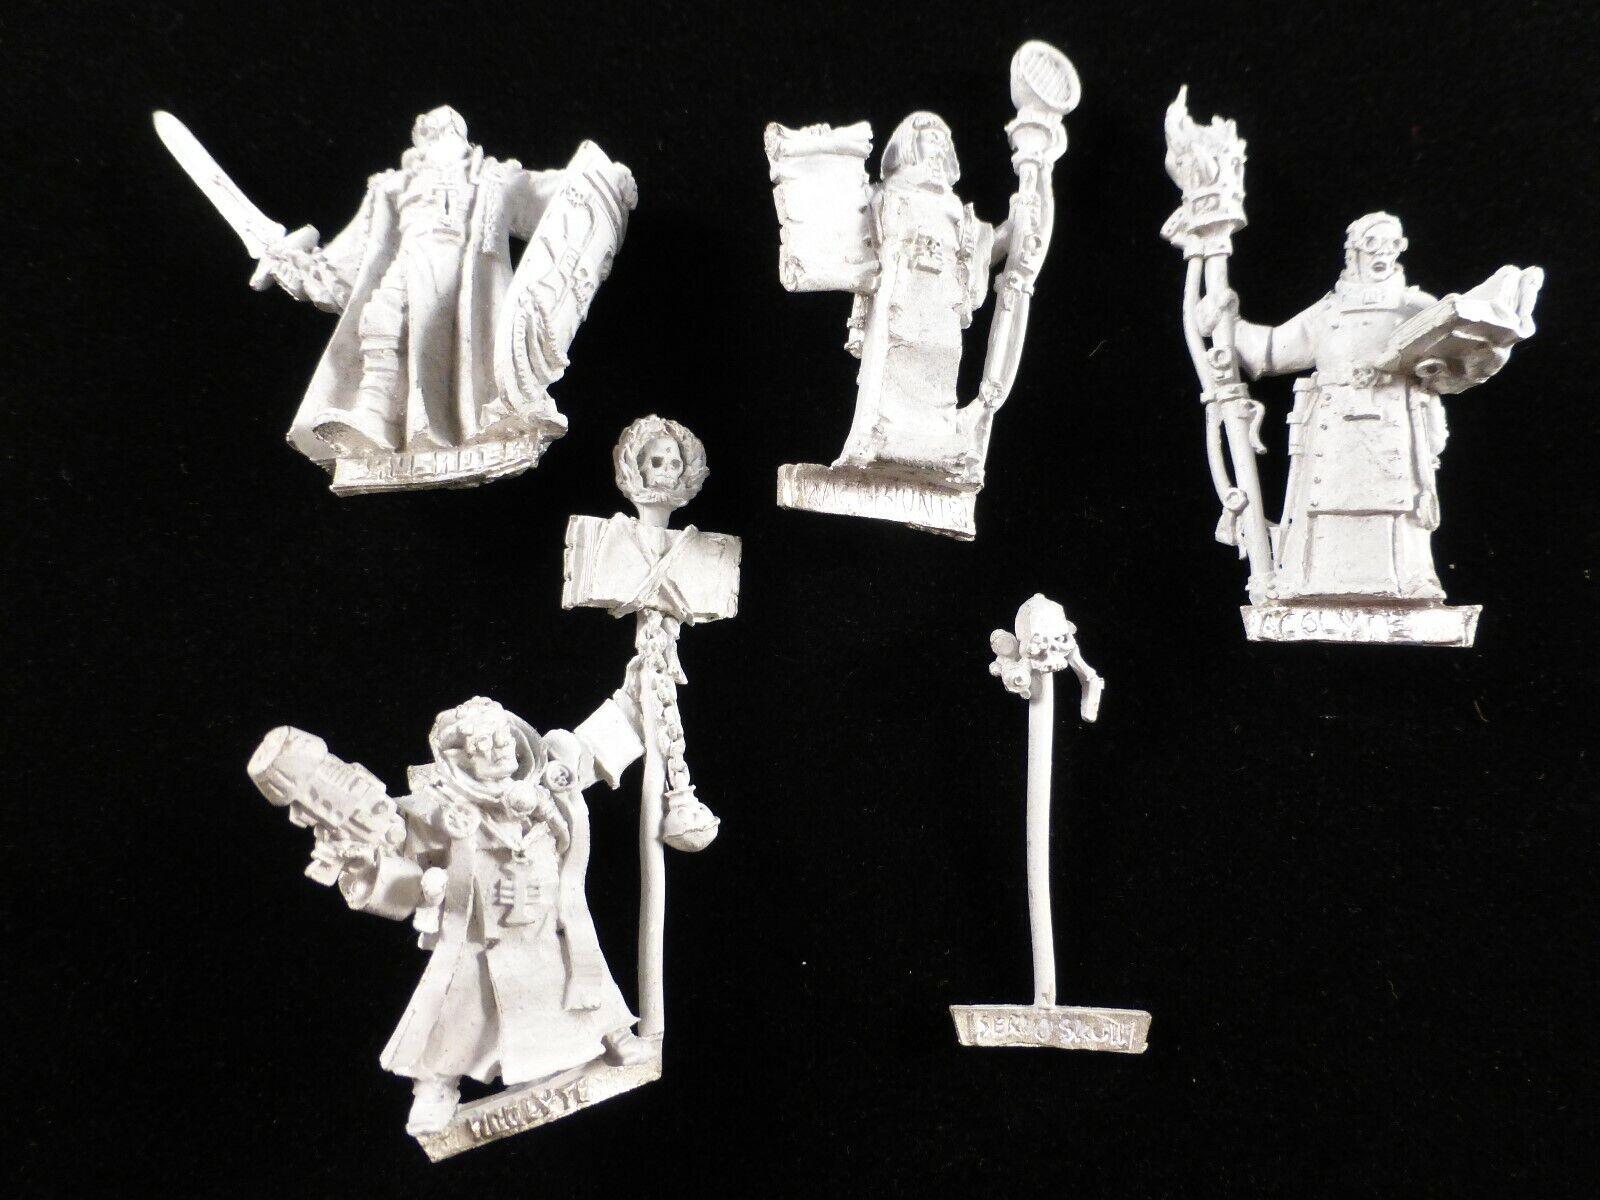 40K Metal inquisidor séquito  Acolyte x2, Crusader, Dialogus, Servo cráneo (5)